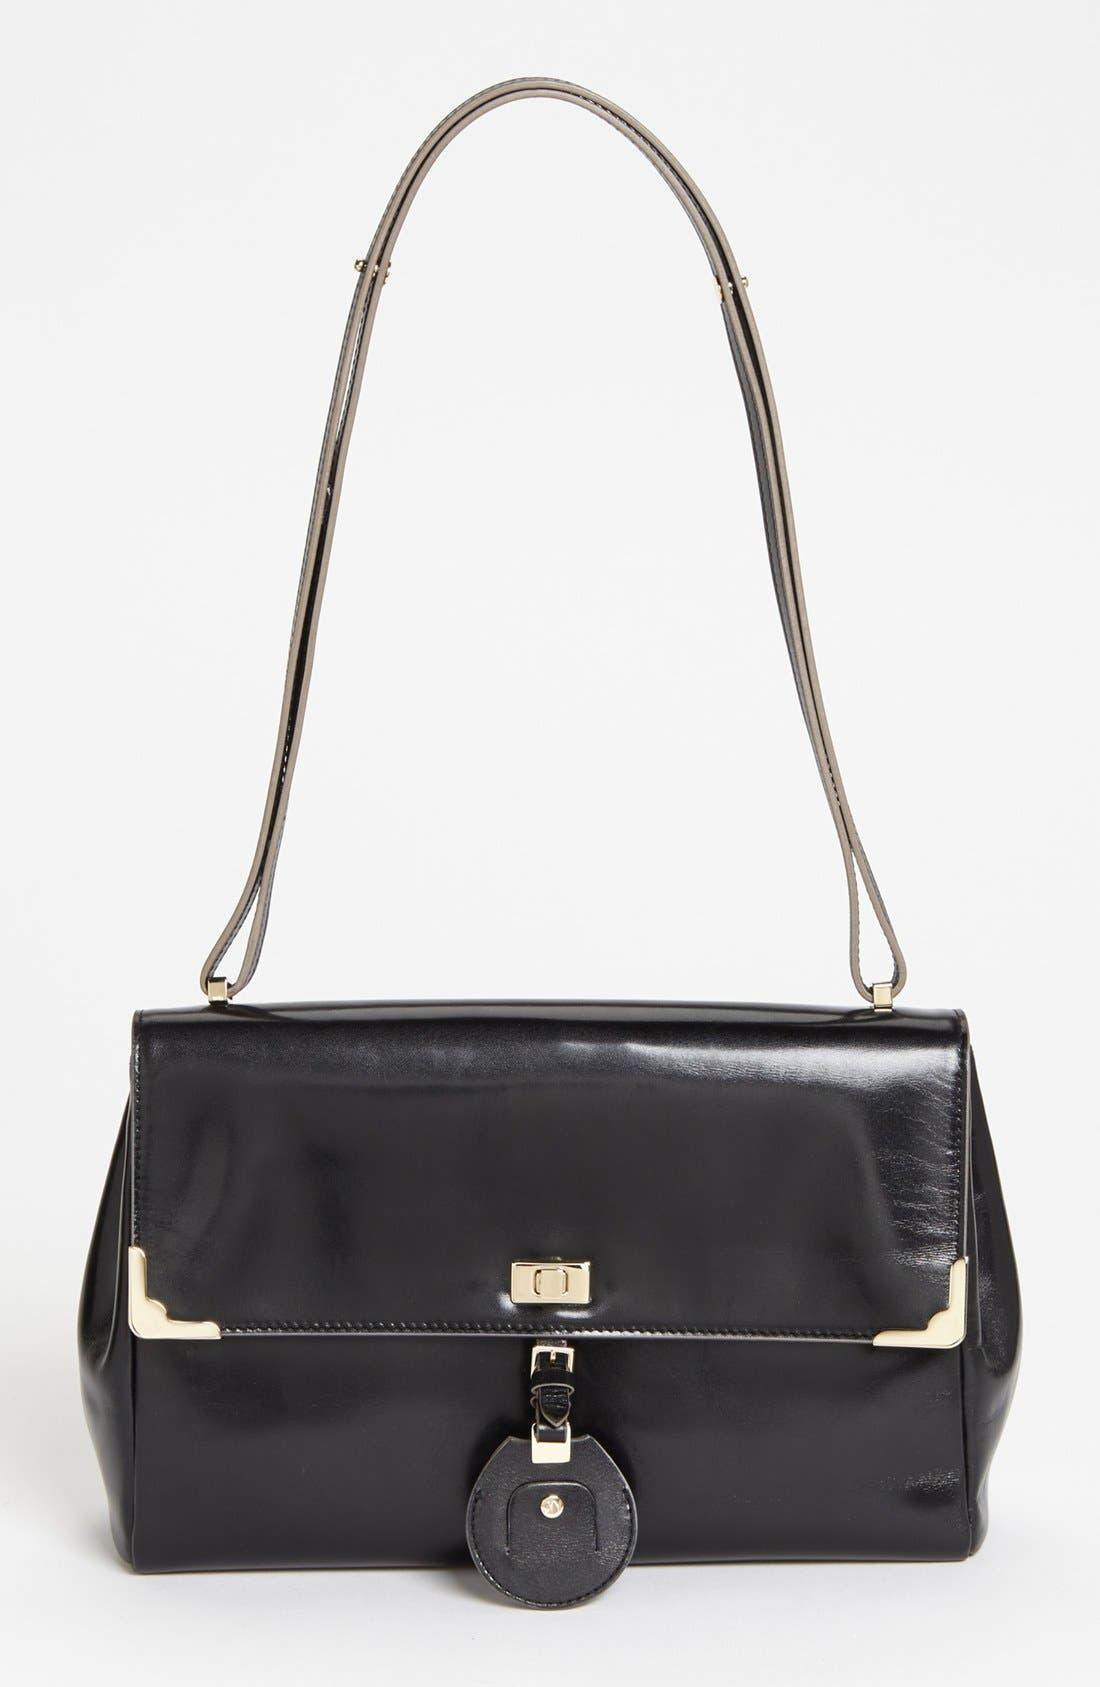 Main Image - Jason Wu 'Jourdan 2' Leather Shoulder Bag